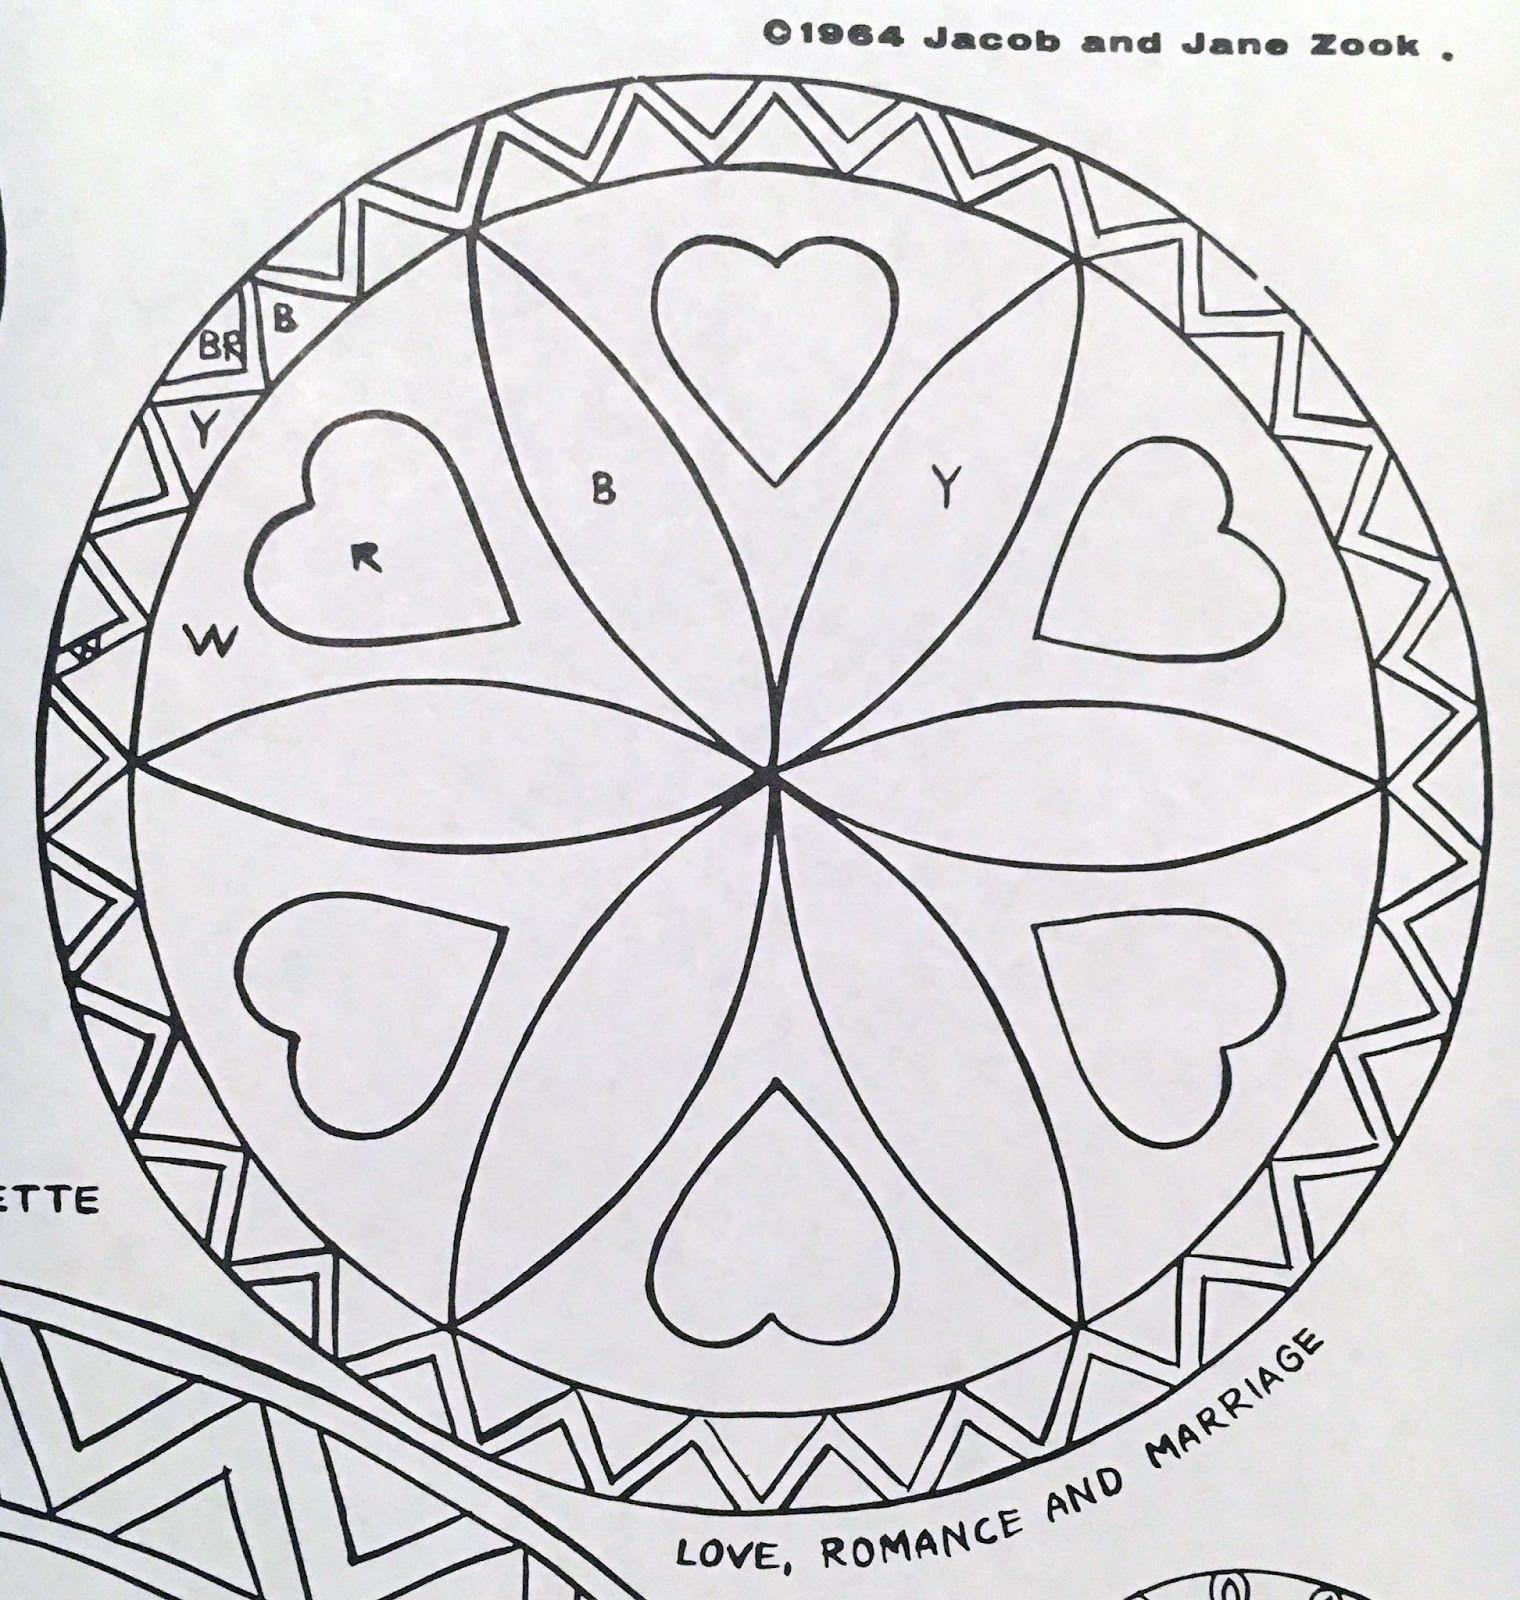 Legendary Pennsylvania Dutch Hex Sign Patterns Zook